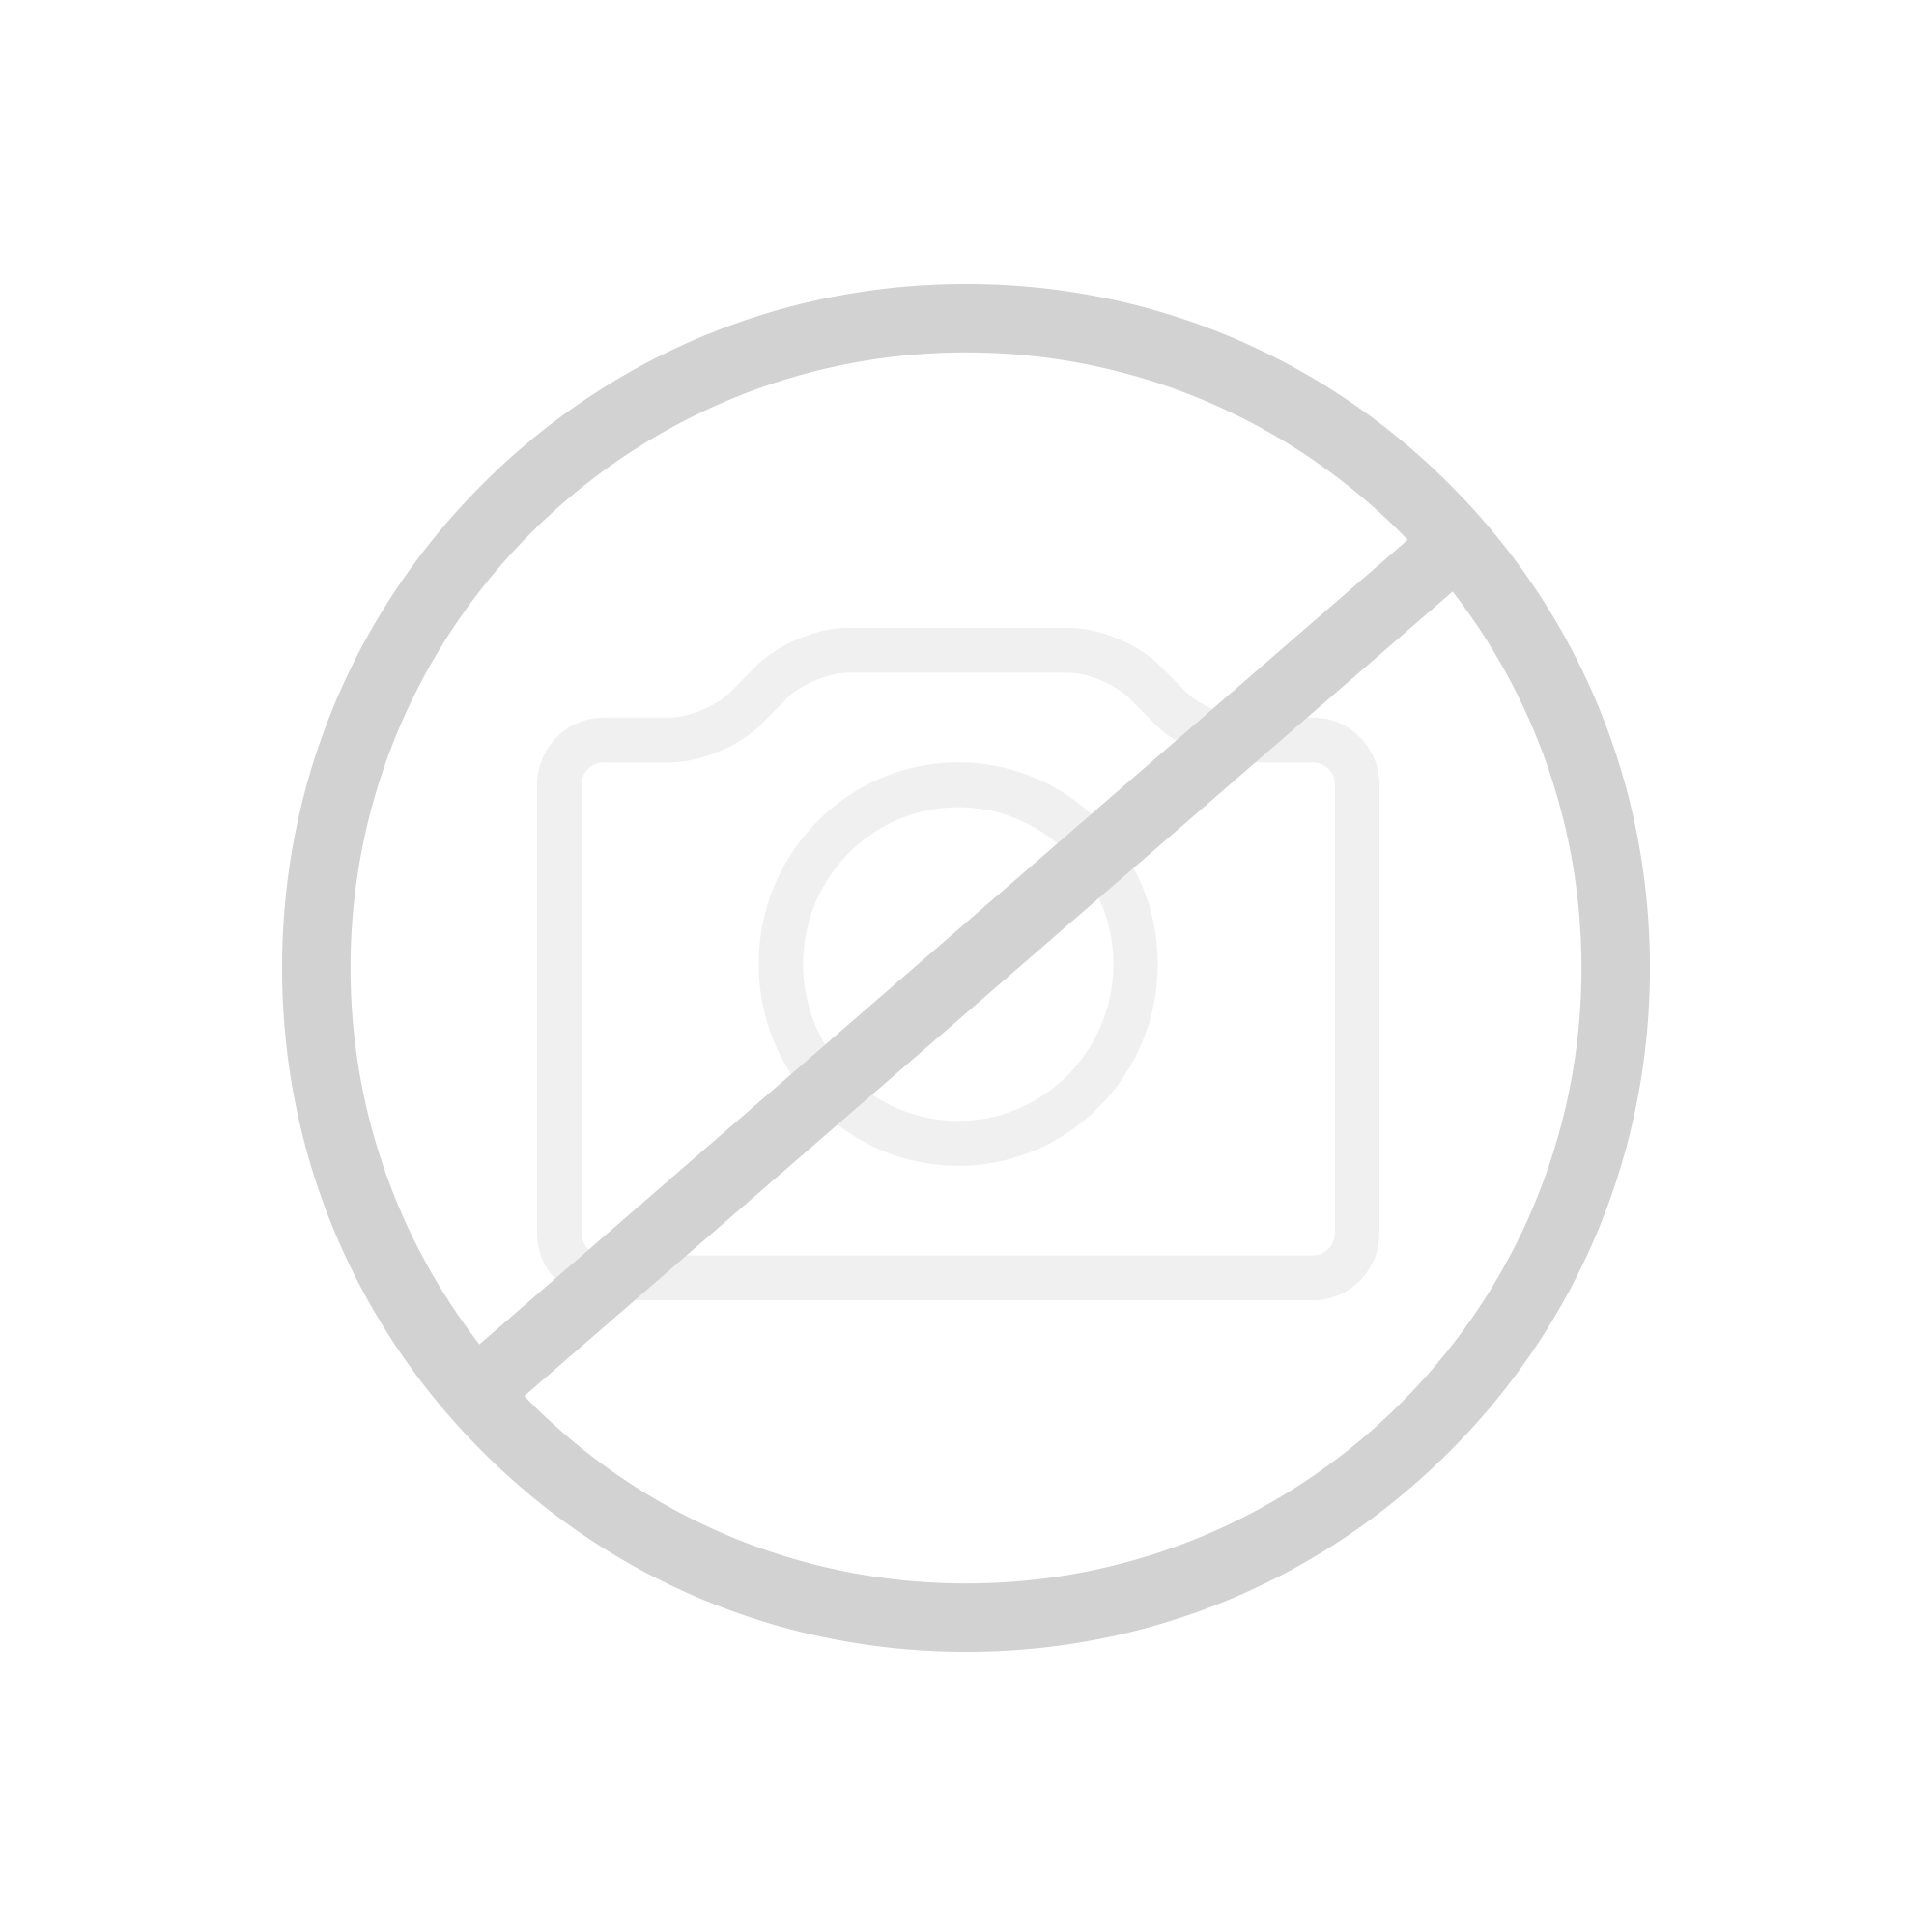 Grohe Eurostyle Cosmopolitan Standventil, XS-Size ohne Ablaufgarnitur